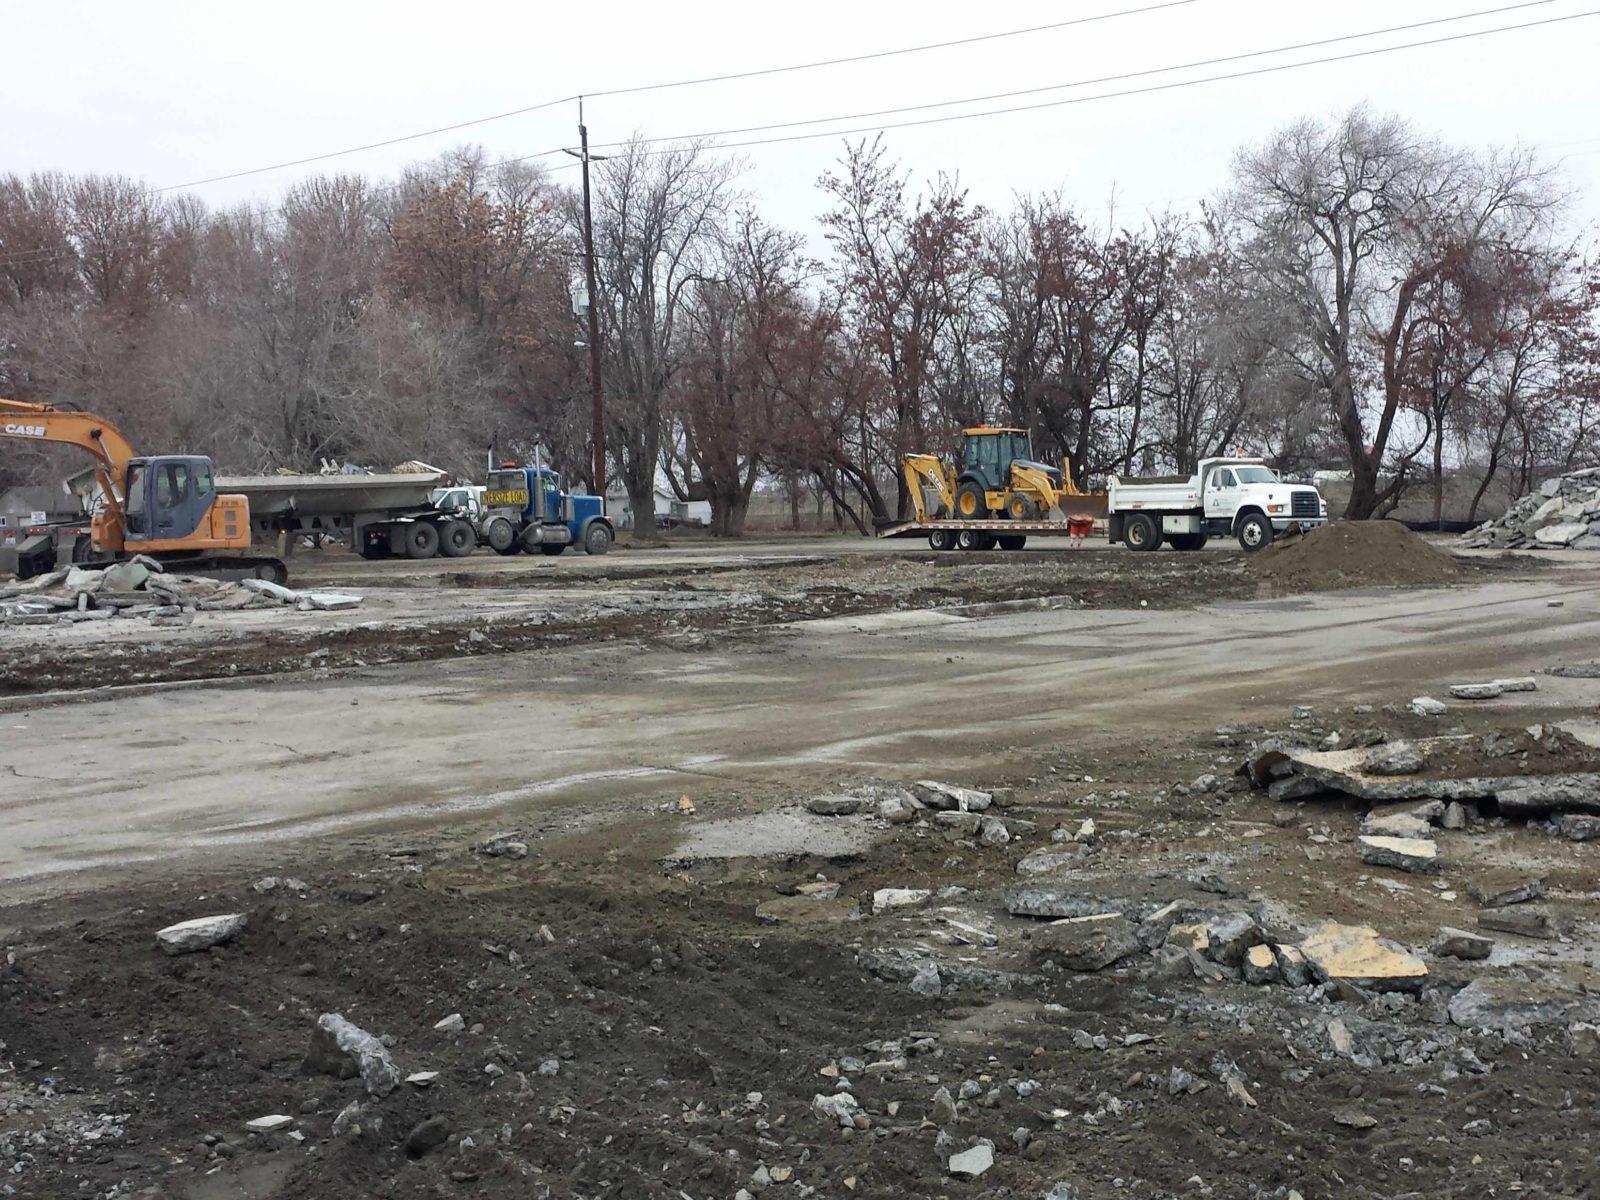 Construction crews remove debris in preparation for construction of Columbia Gardens.